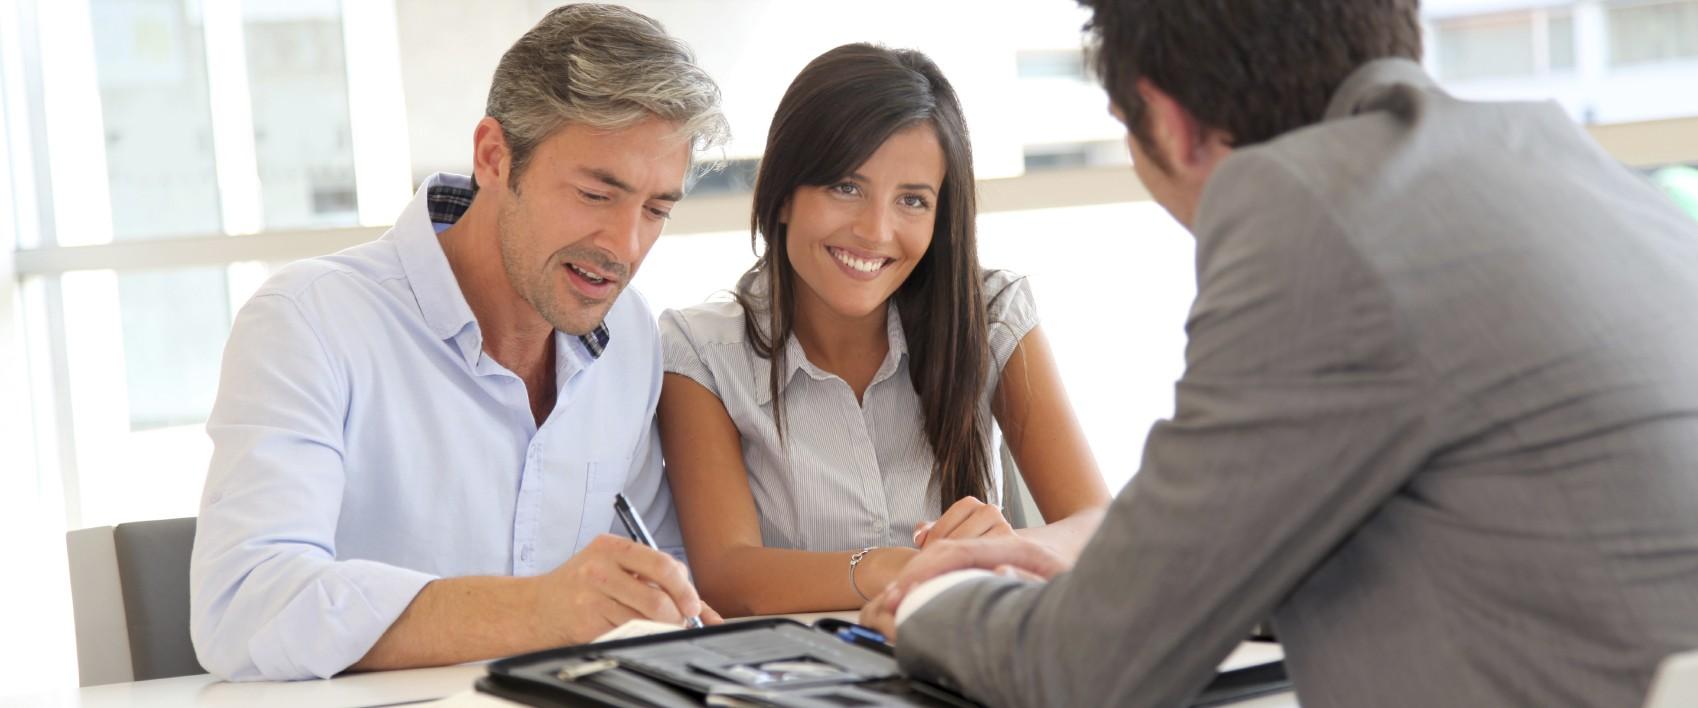 Financial-advice-e1350447530561